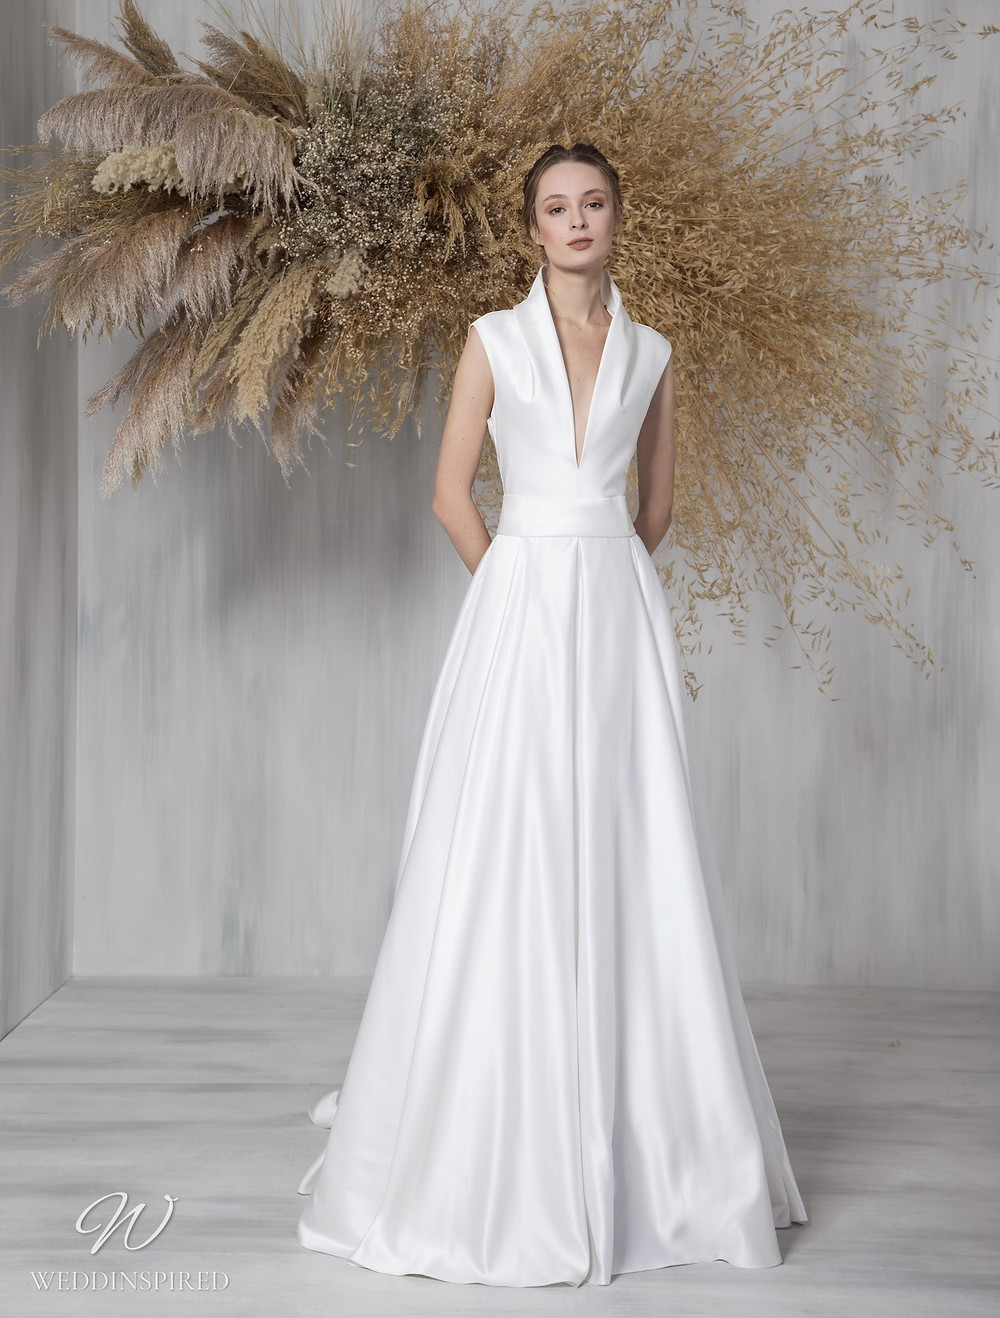 A Tony Ward 2021 satin A-line wedding dress with a v neck and a collar